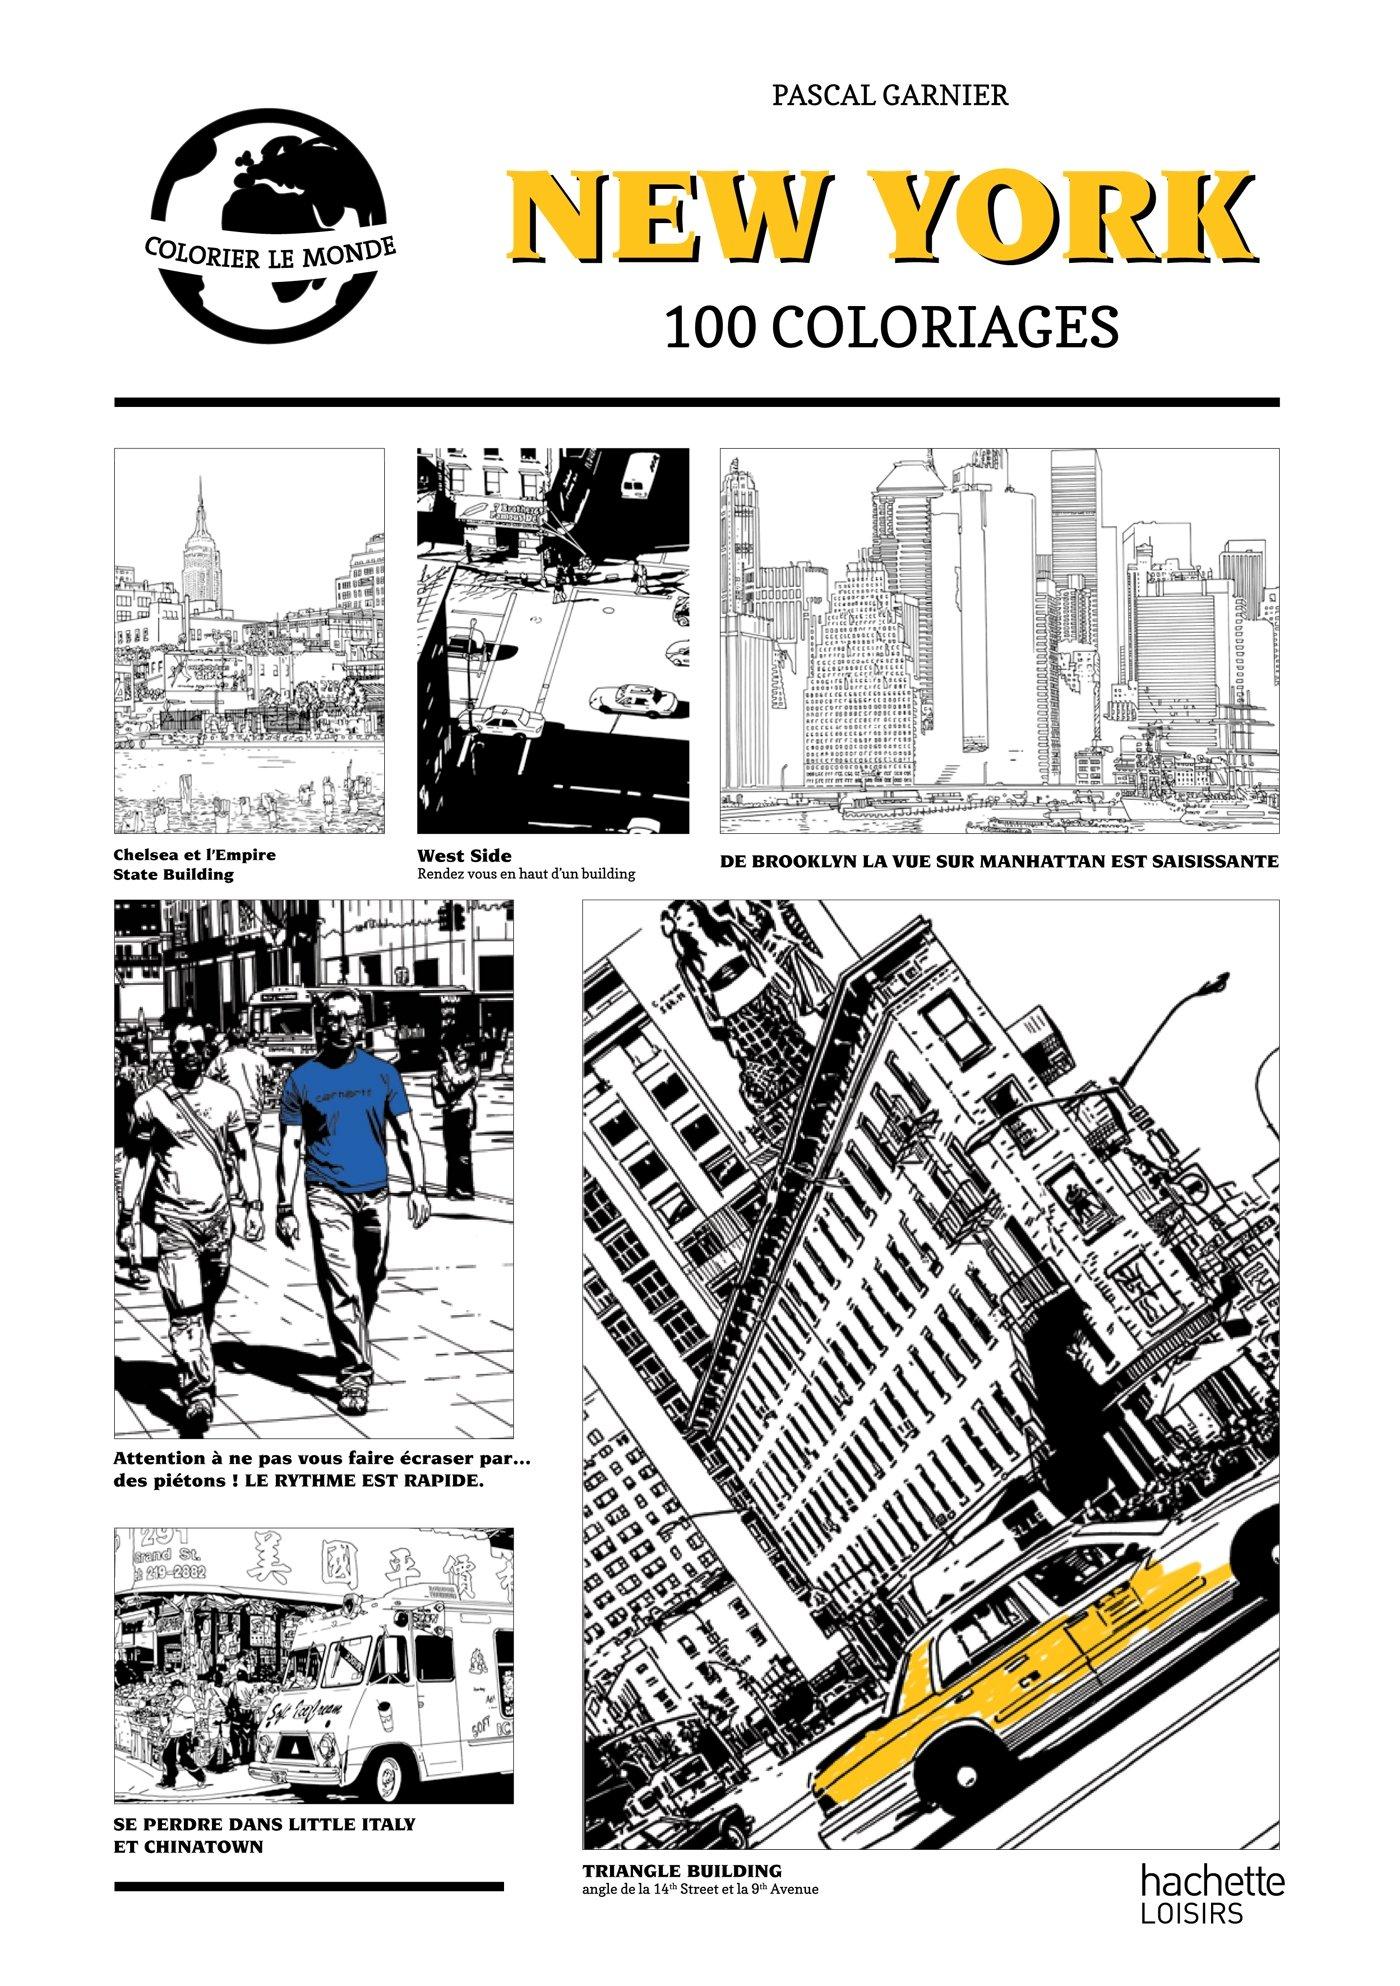 Coloriage Adulte New York.Livre Coloriage Adulte New York